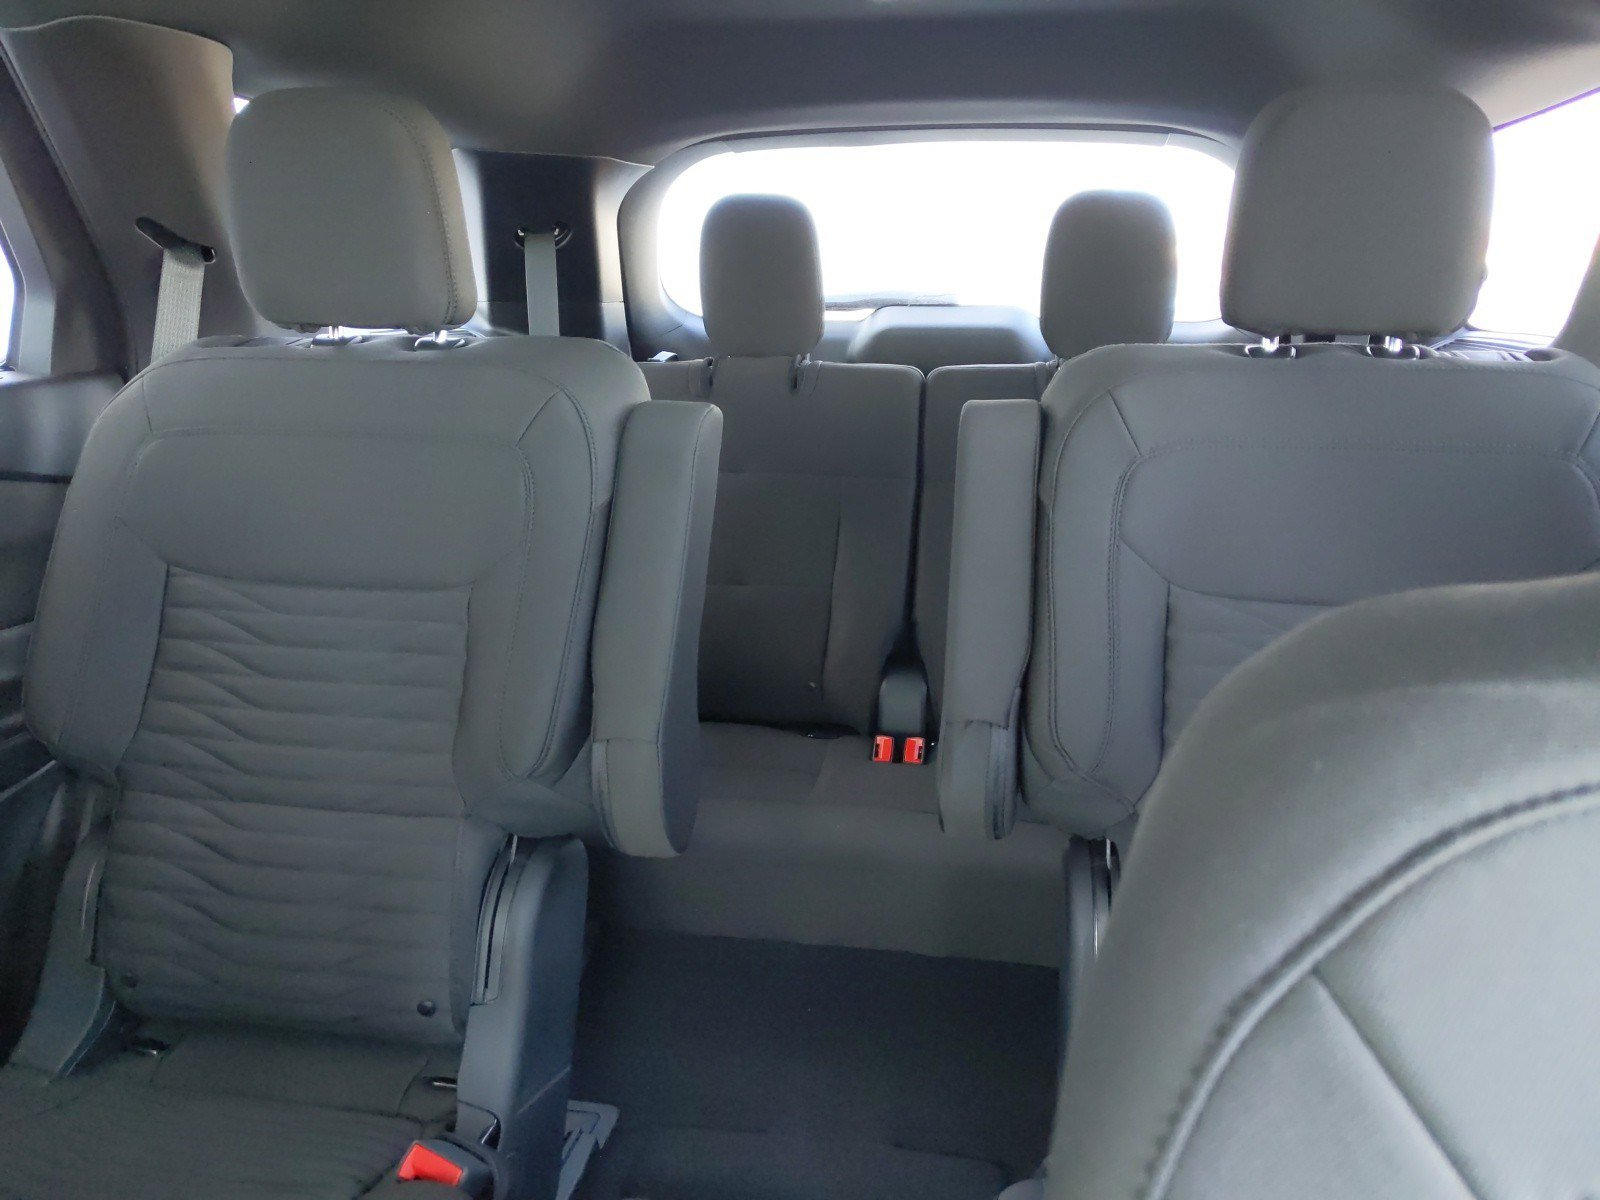 Used 2020 Ford Explorer XLT Sport Utility for sale in Lincoln NE